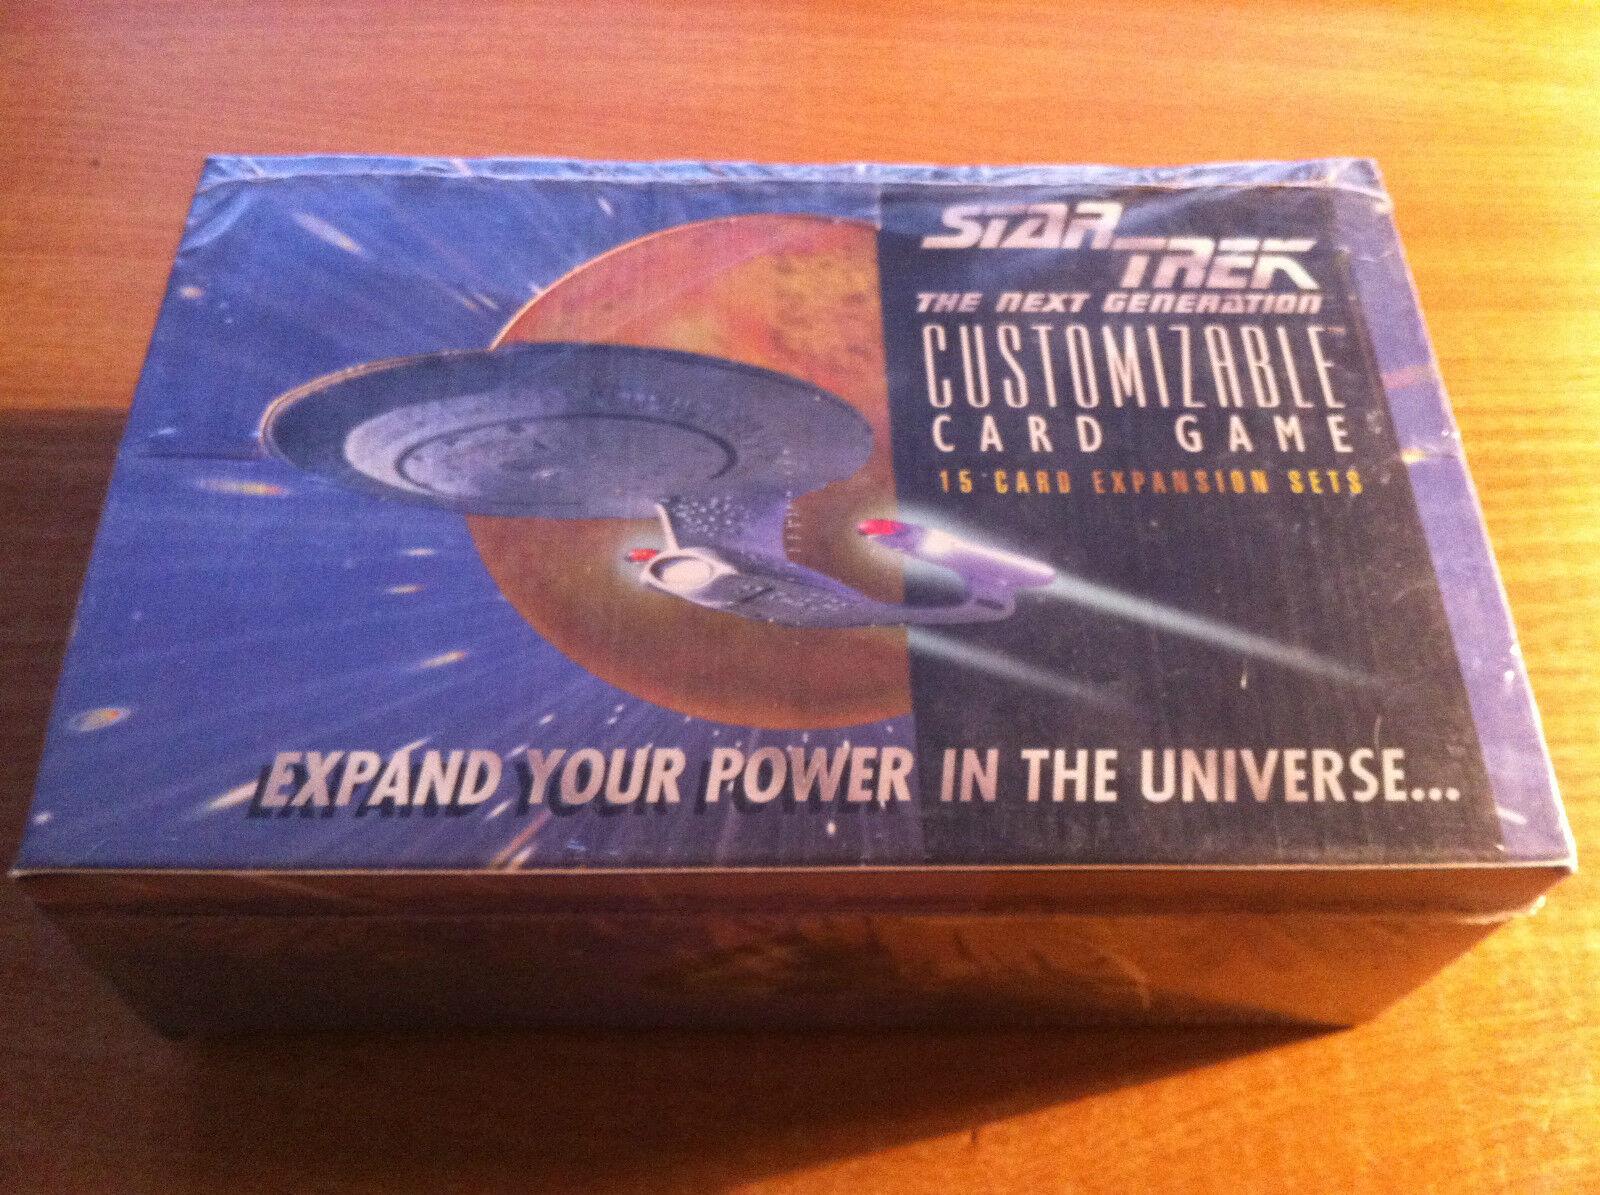 Star Trek Ccg whiteo Frontera Premiere Precinto Fábrica Booster Caja